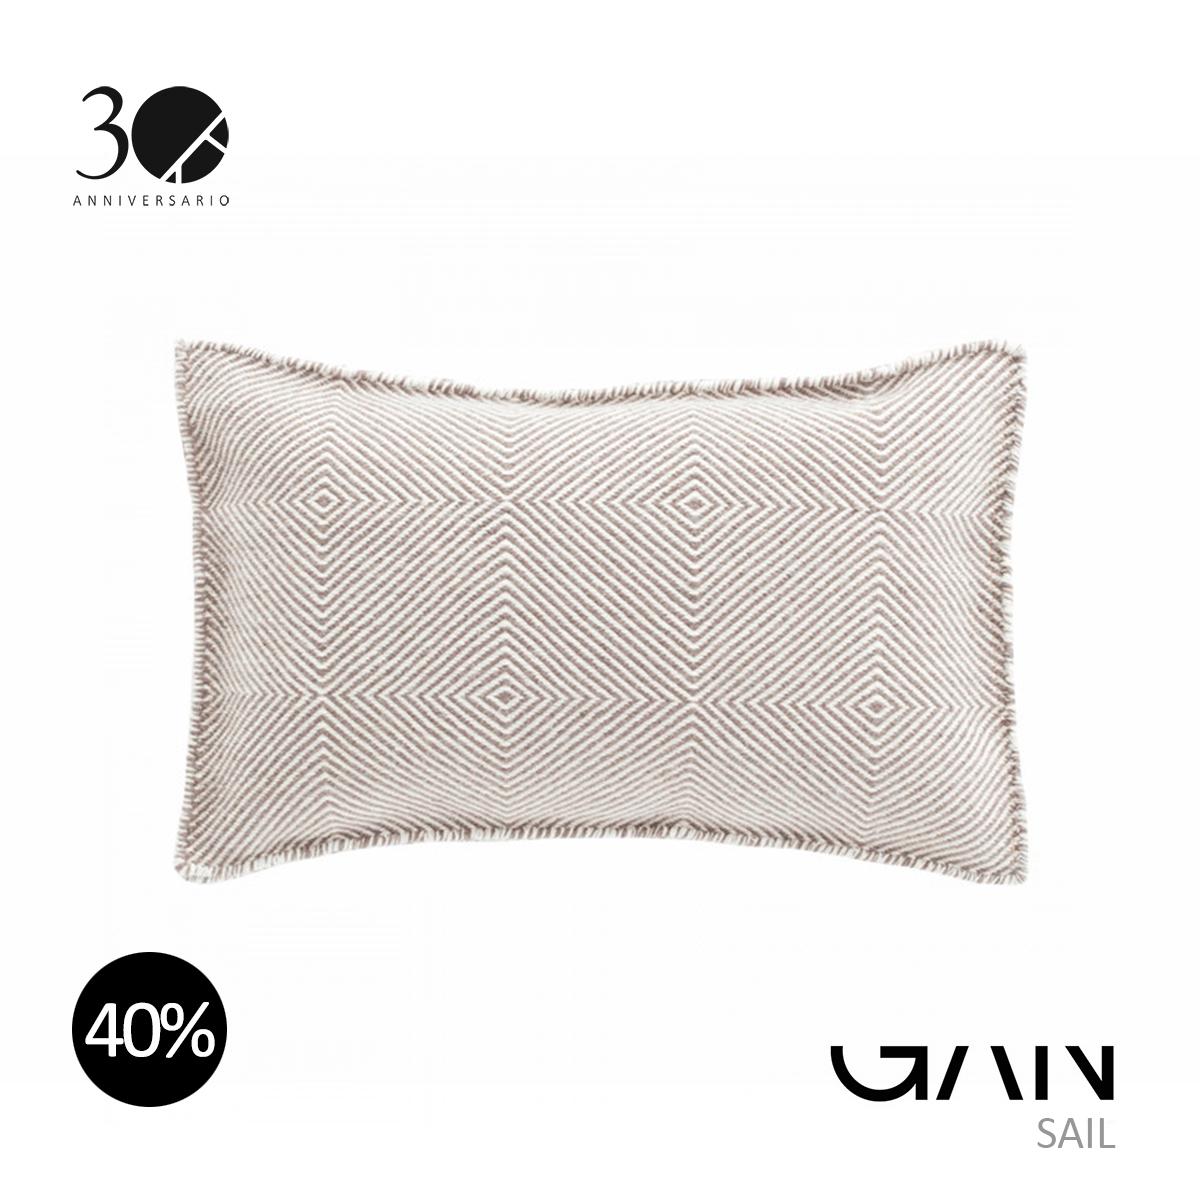 GAN - SAIL 2